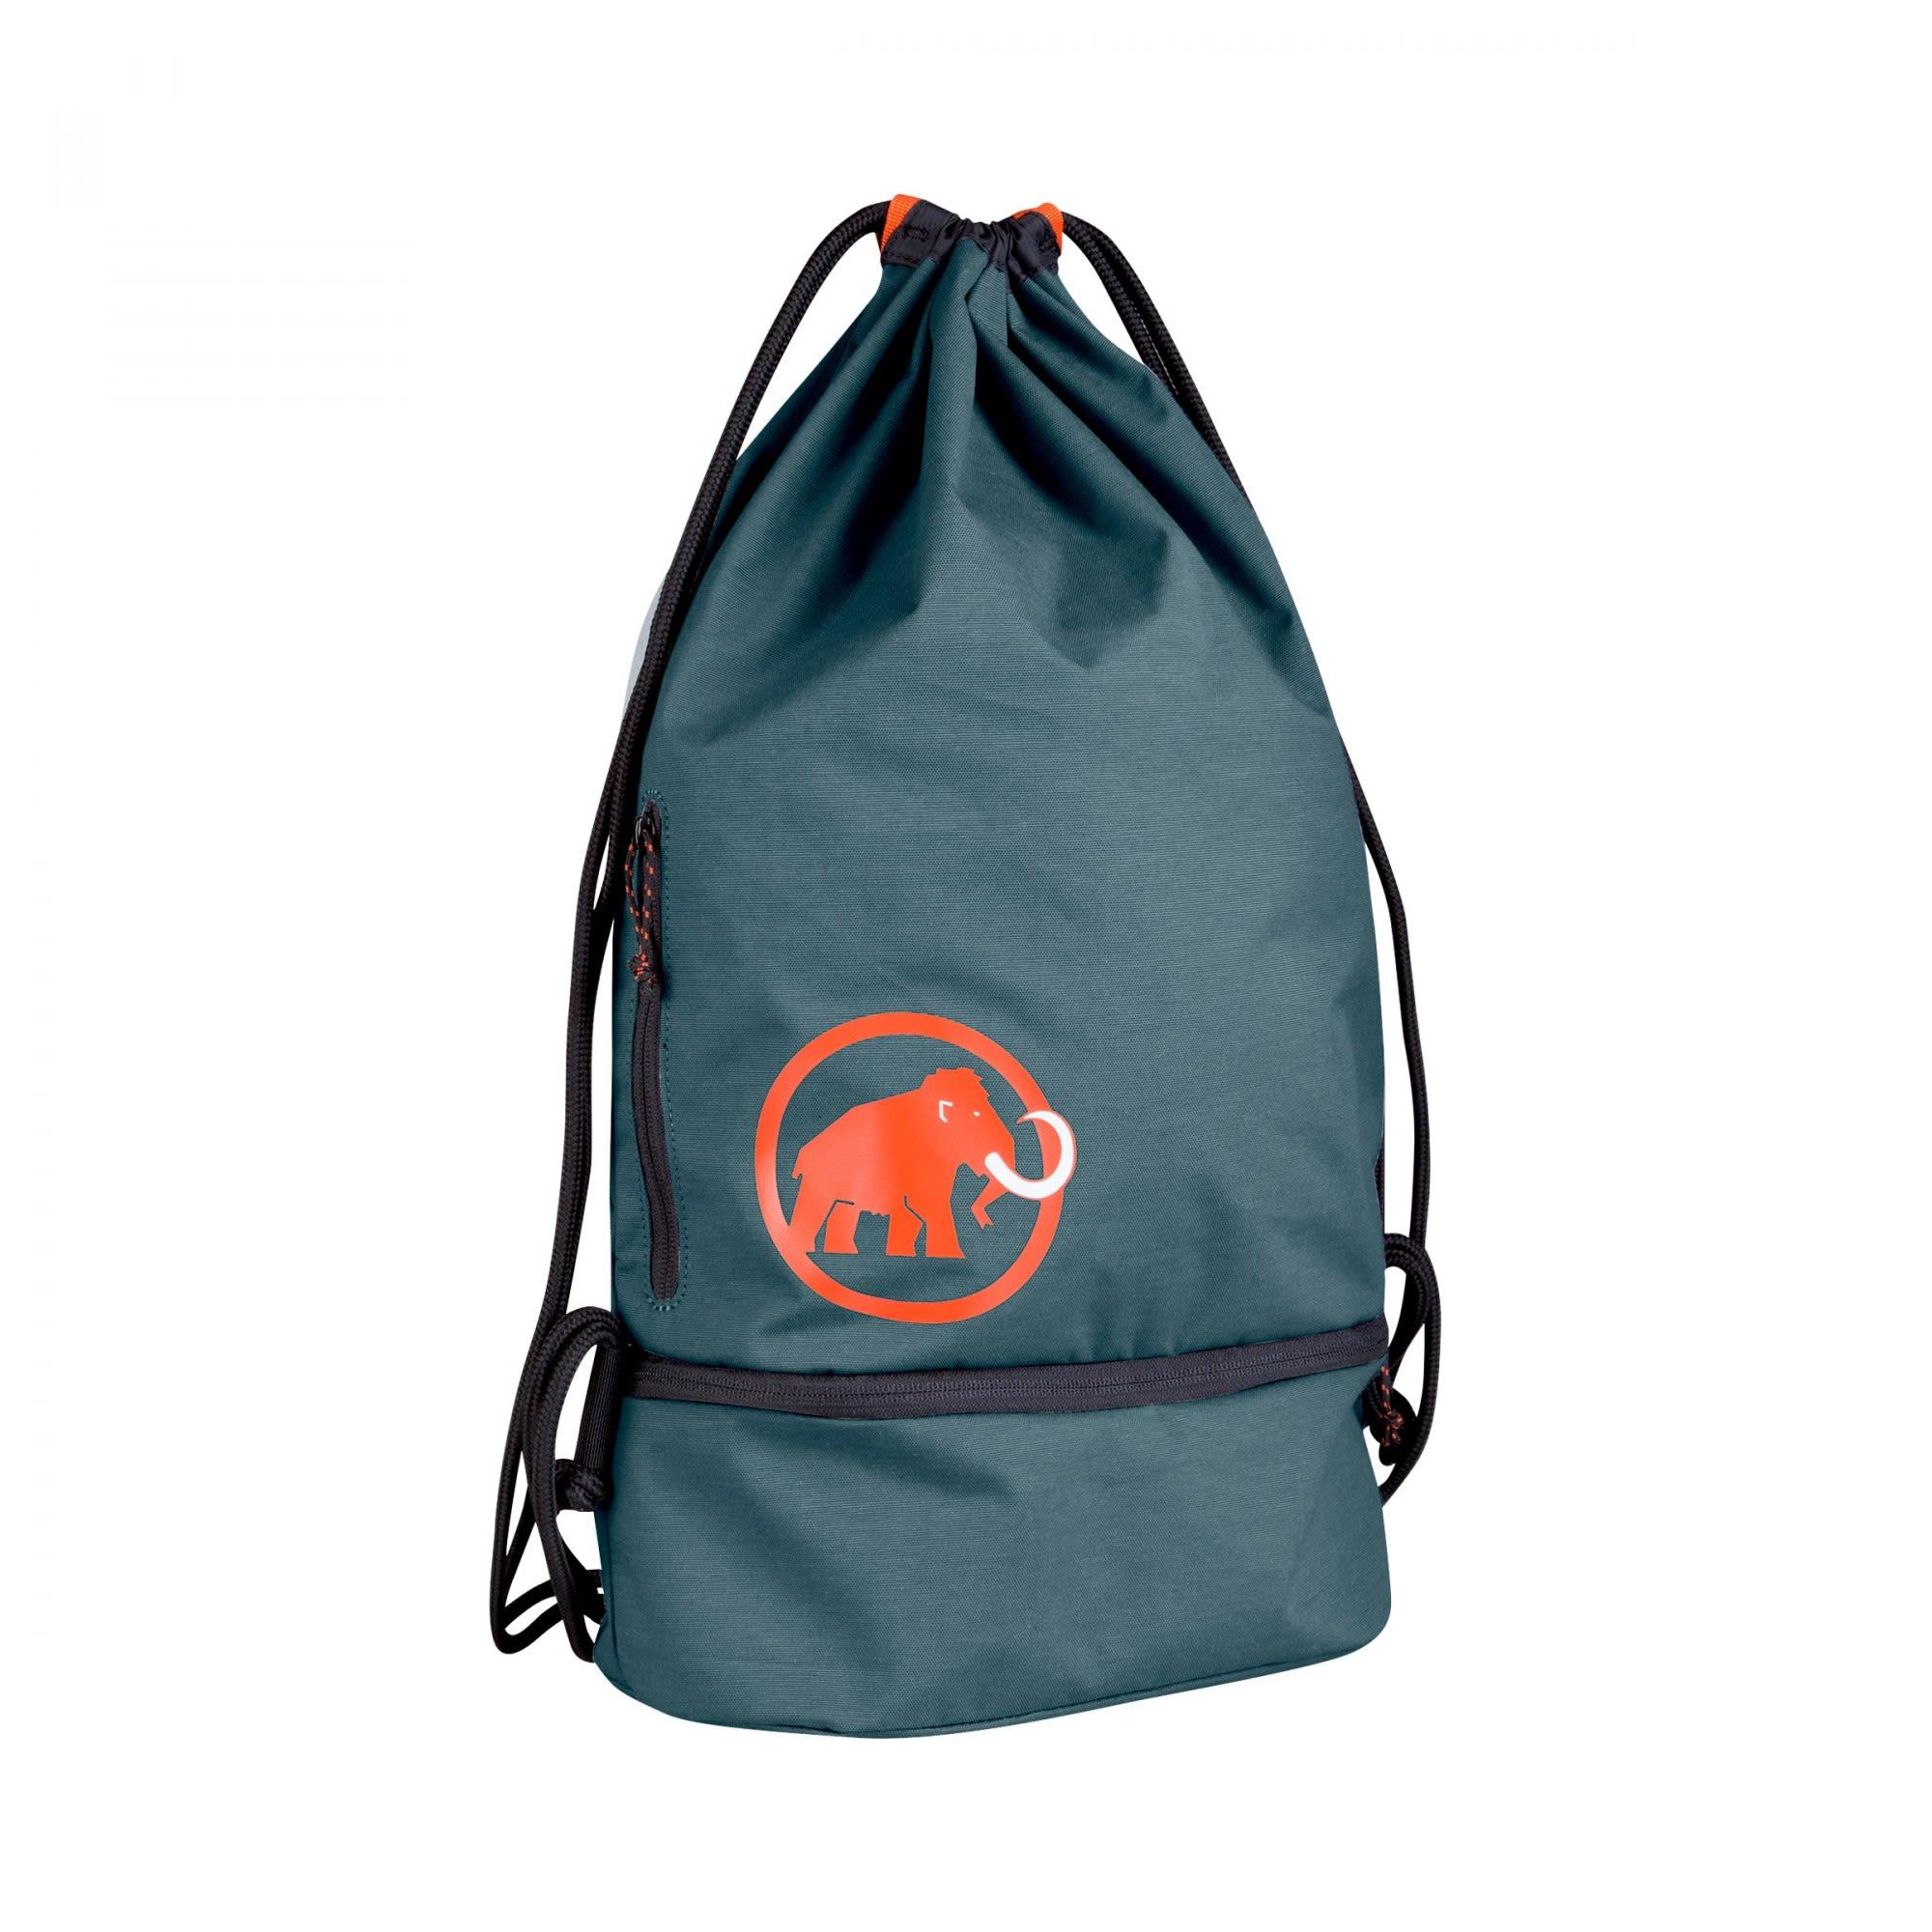 Mammut Magic Gym Bag Blau, One Size -Farbe Dark Chill, One Size